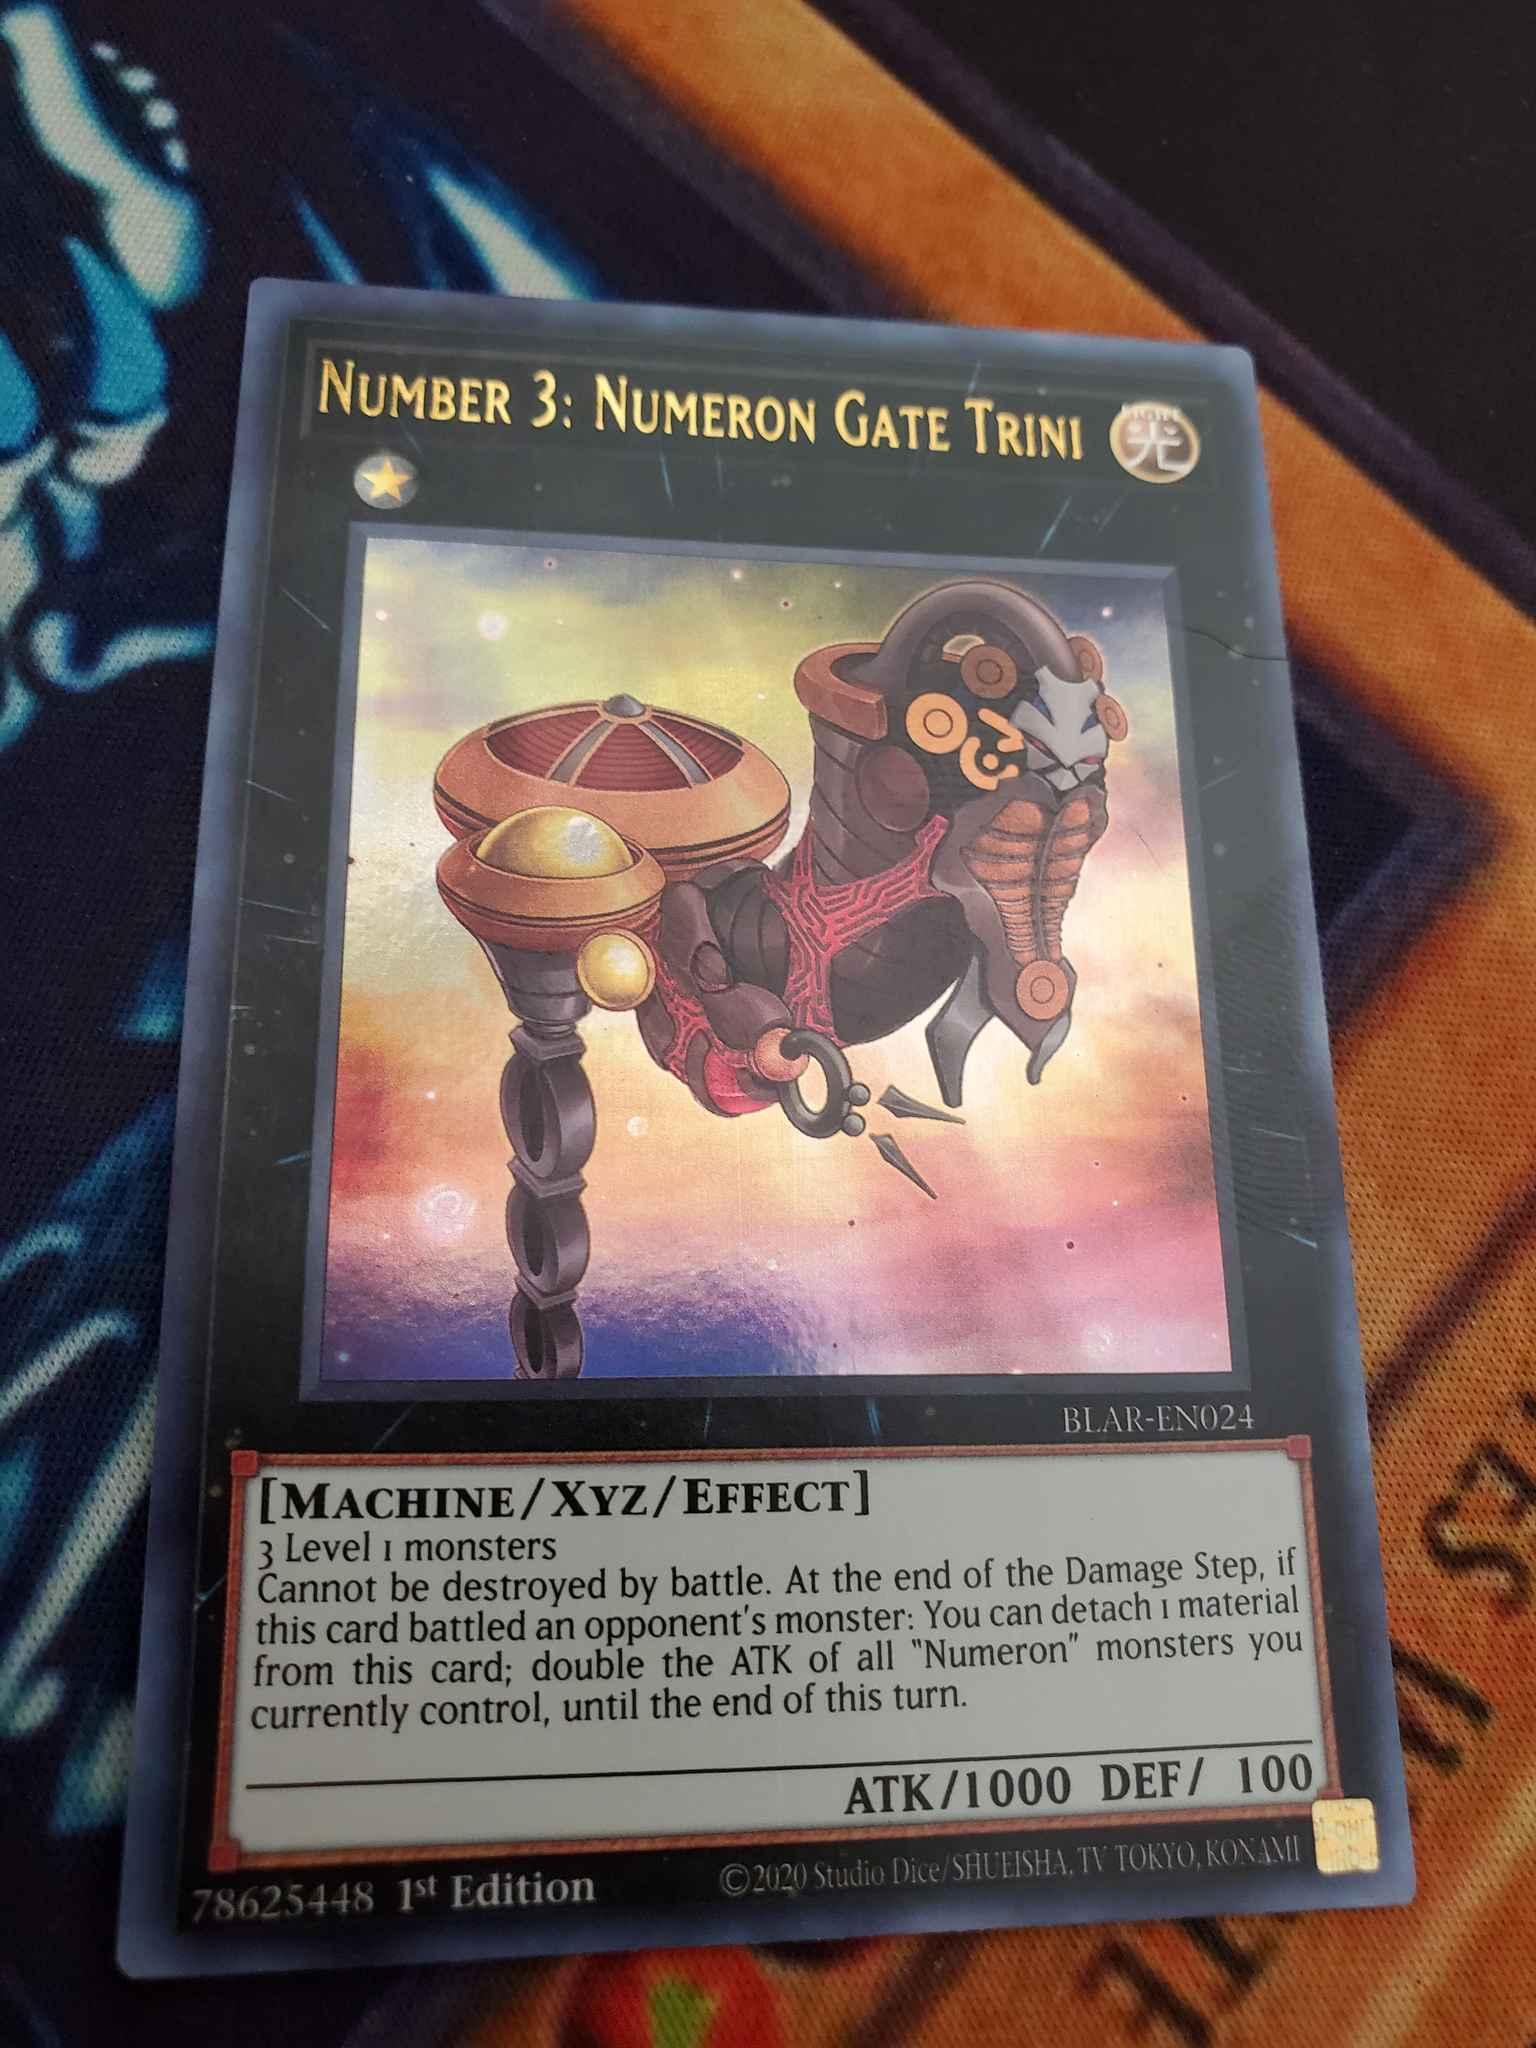 Ultra Rare Number 3: Numeron Gate Trini BLAR-EN024 1st Edition Near Mint